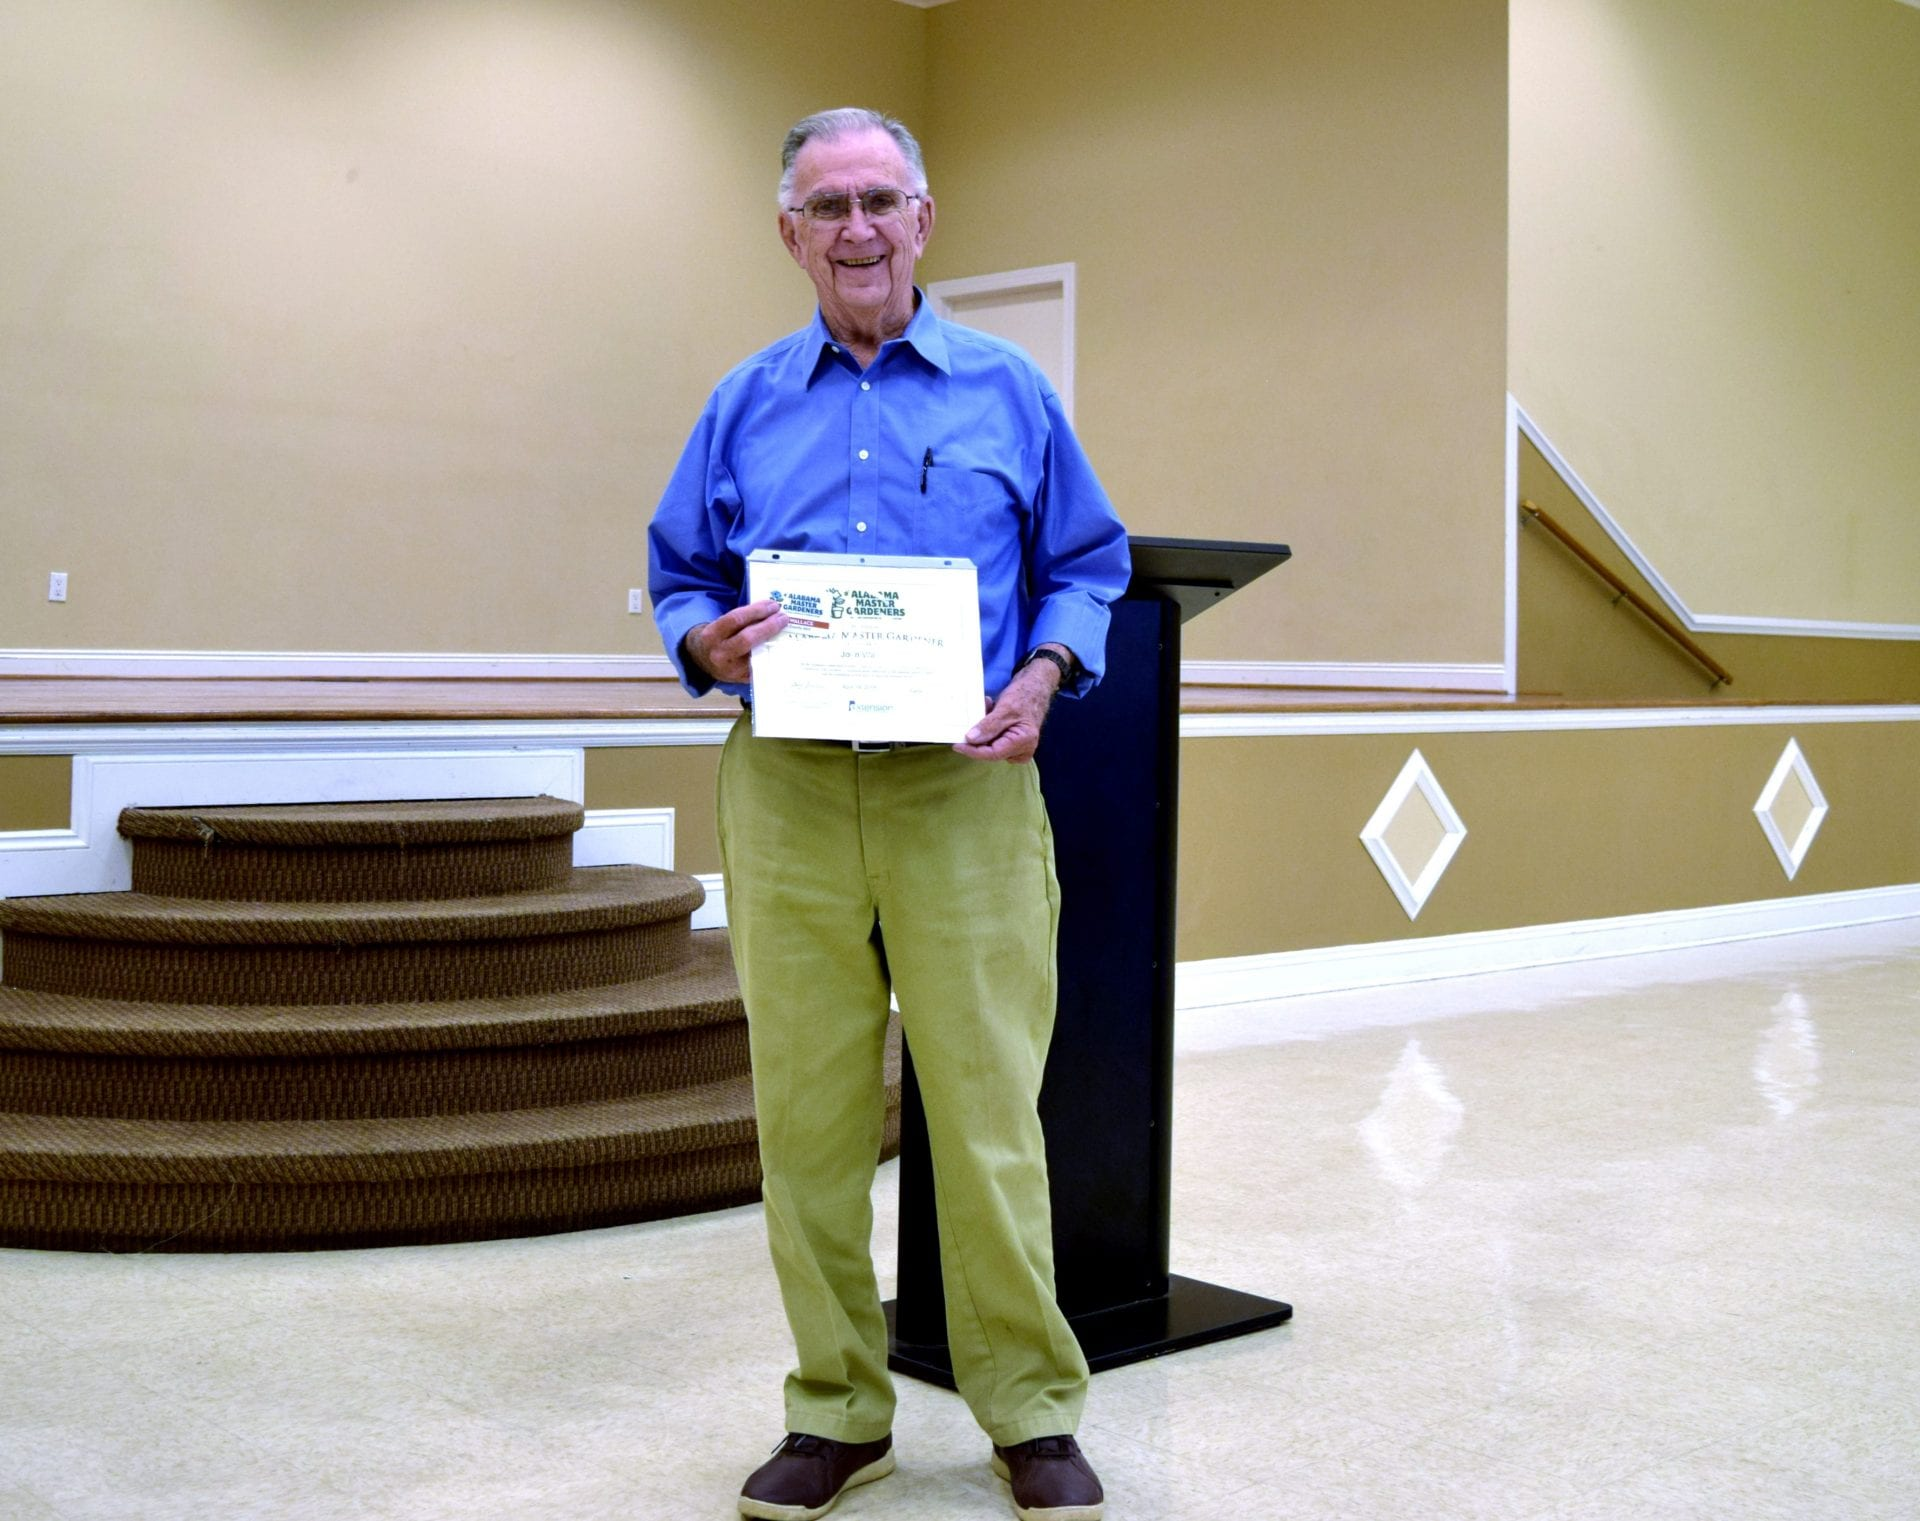 John Wallace getting certificate